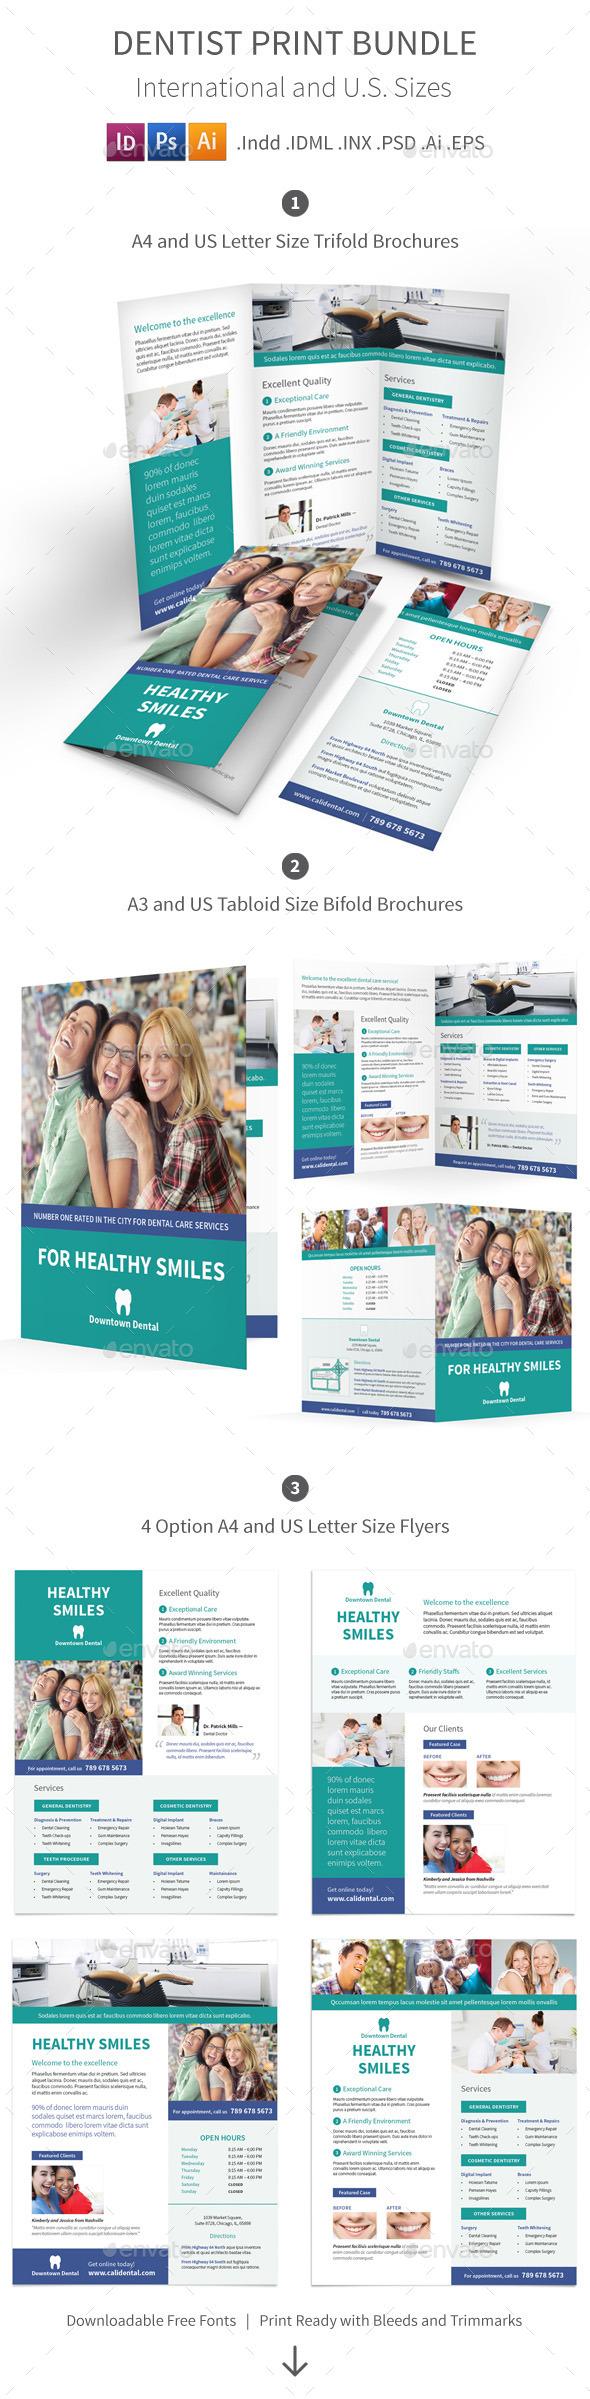 Dentist Print Bundle - Informational Brochures